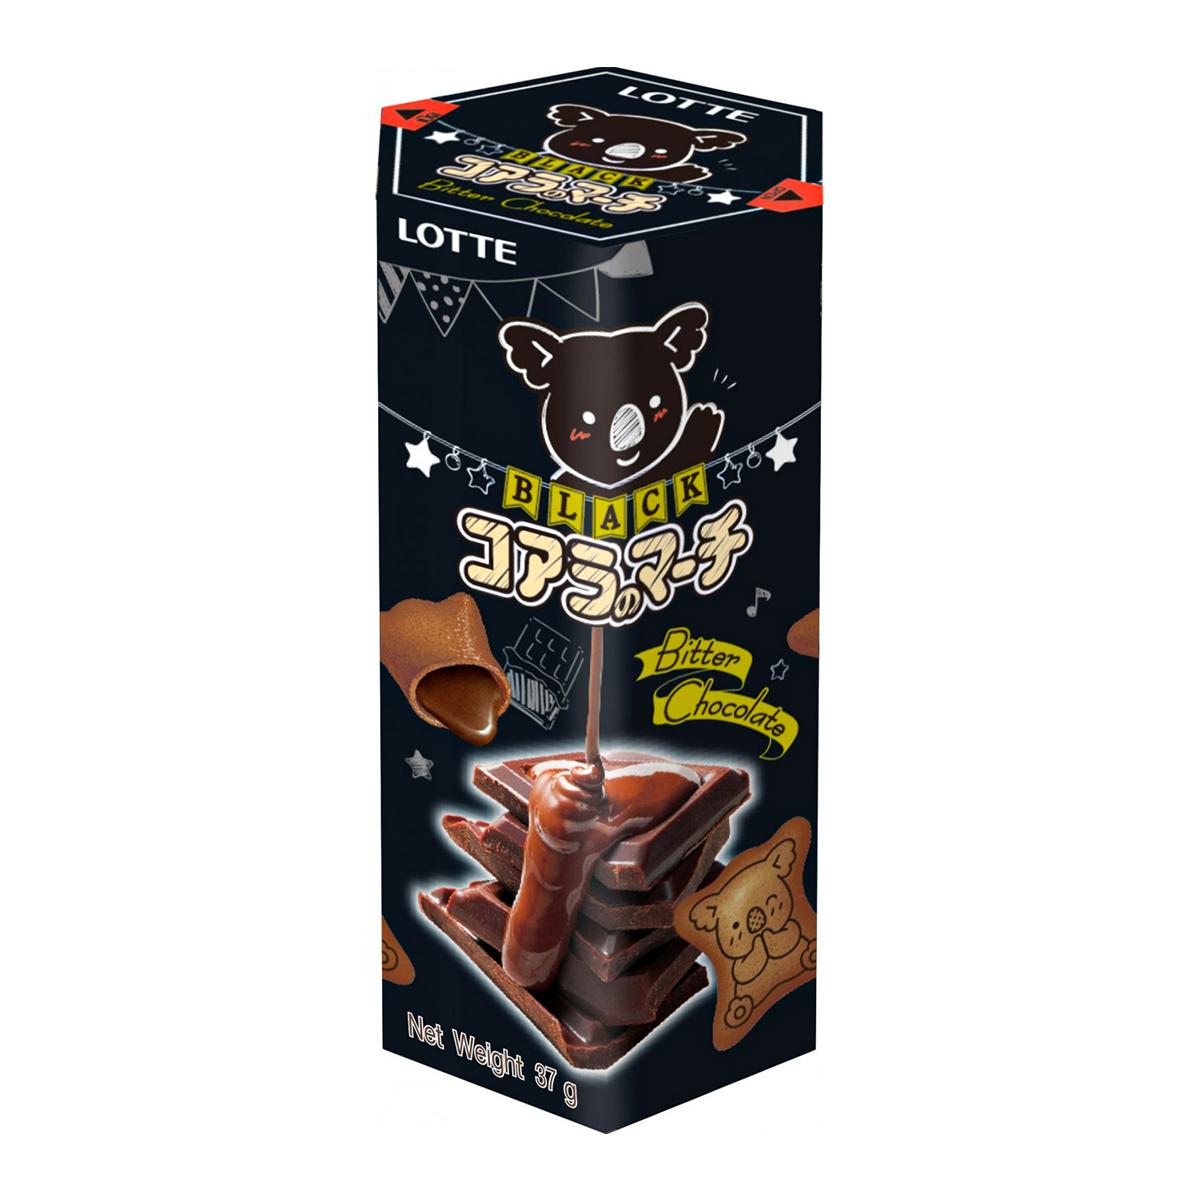 Biscoito Koala com Recheio Chocolate Amargo Lotte - 33 gramas